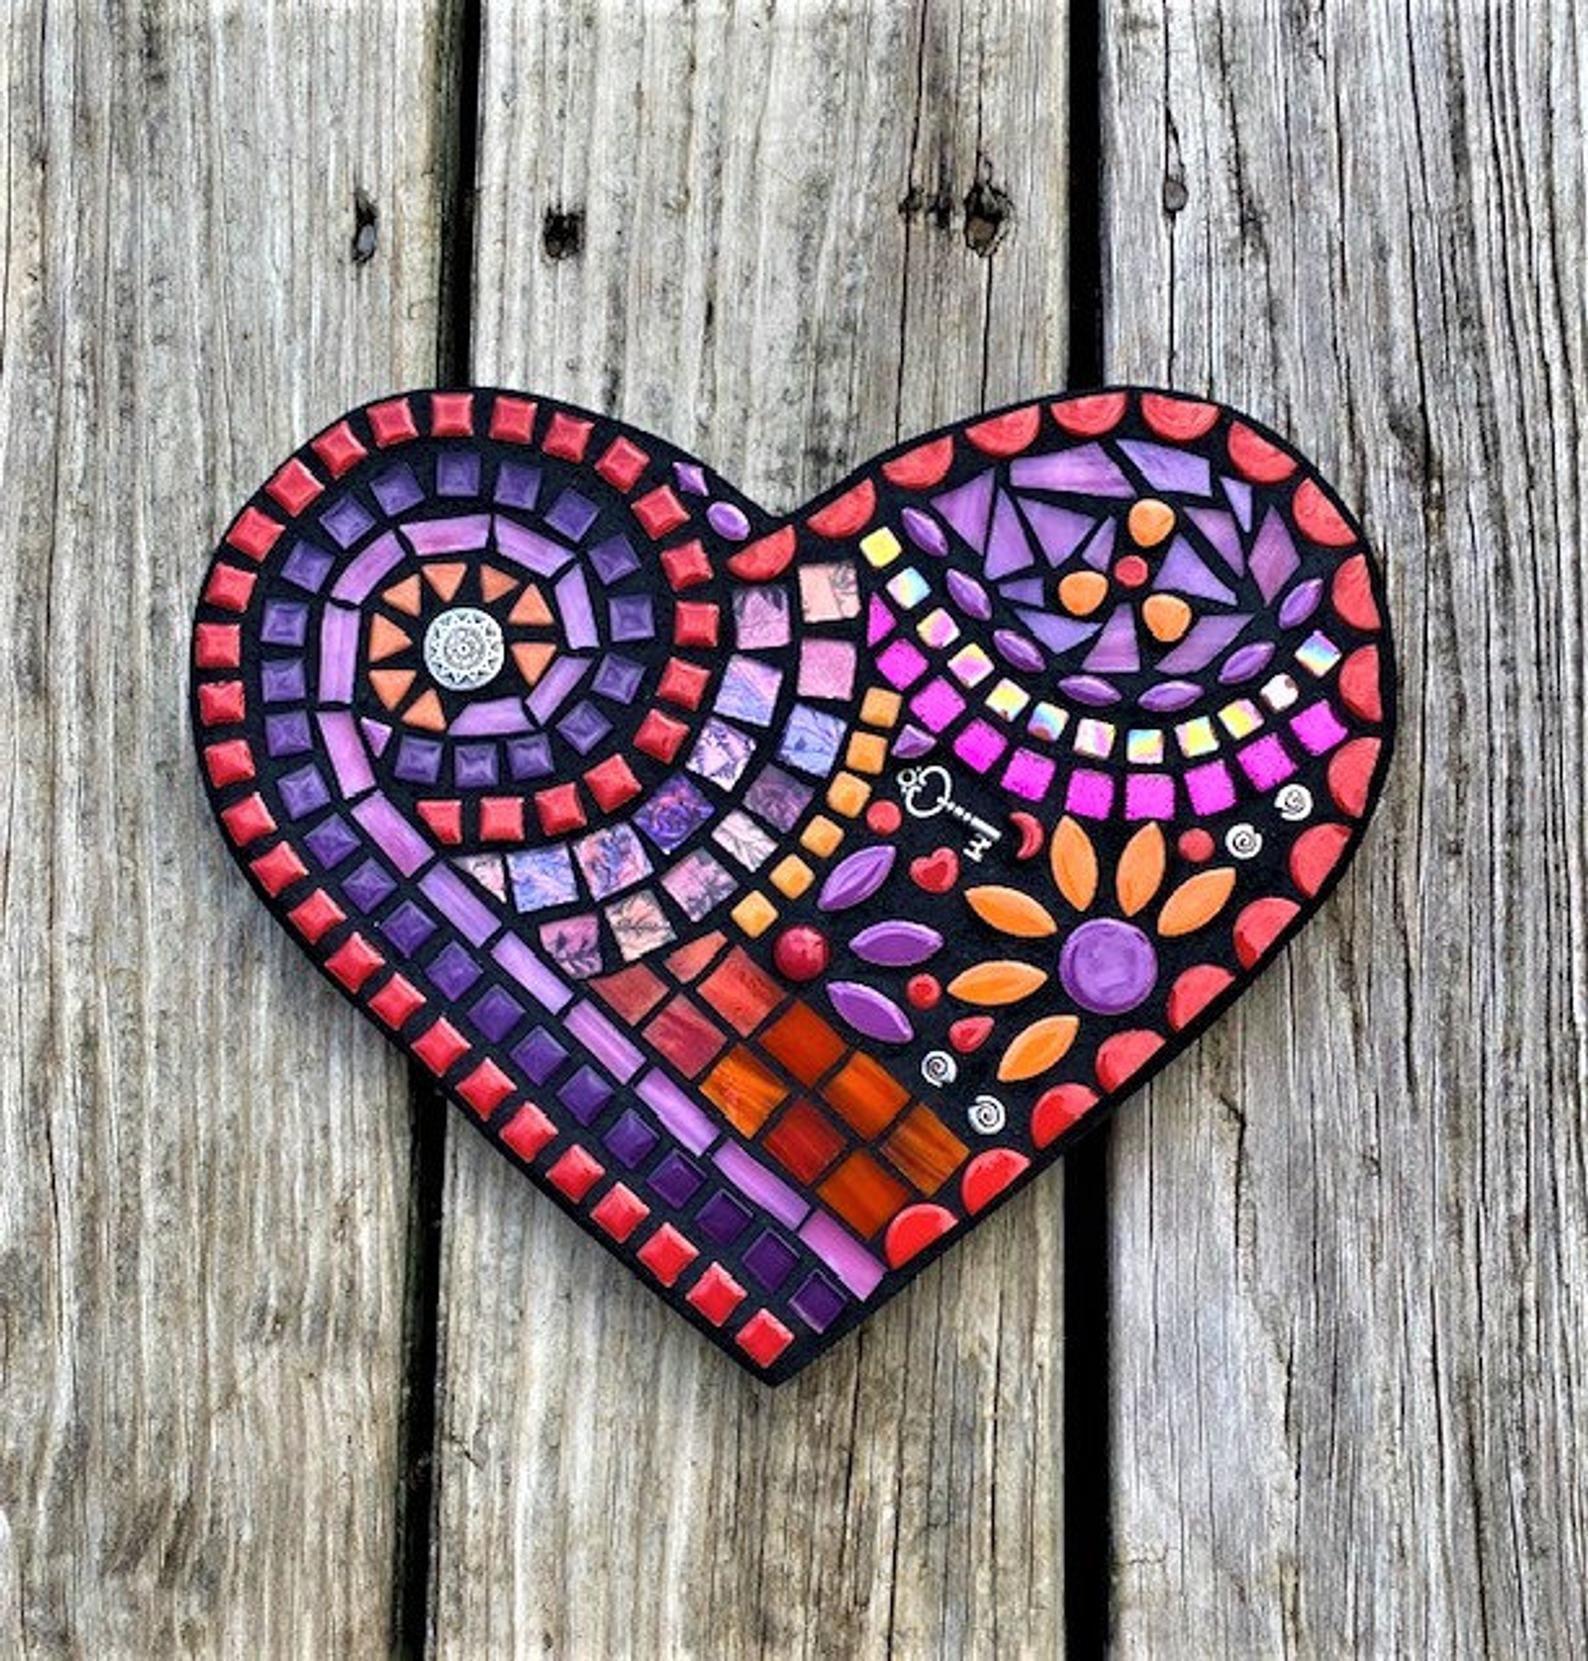 Red Daisy Mosaic Wall Hanging-framed mosaic art-mixed media mosaic-mosaic glass art-decorative art-wall decor